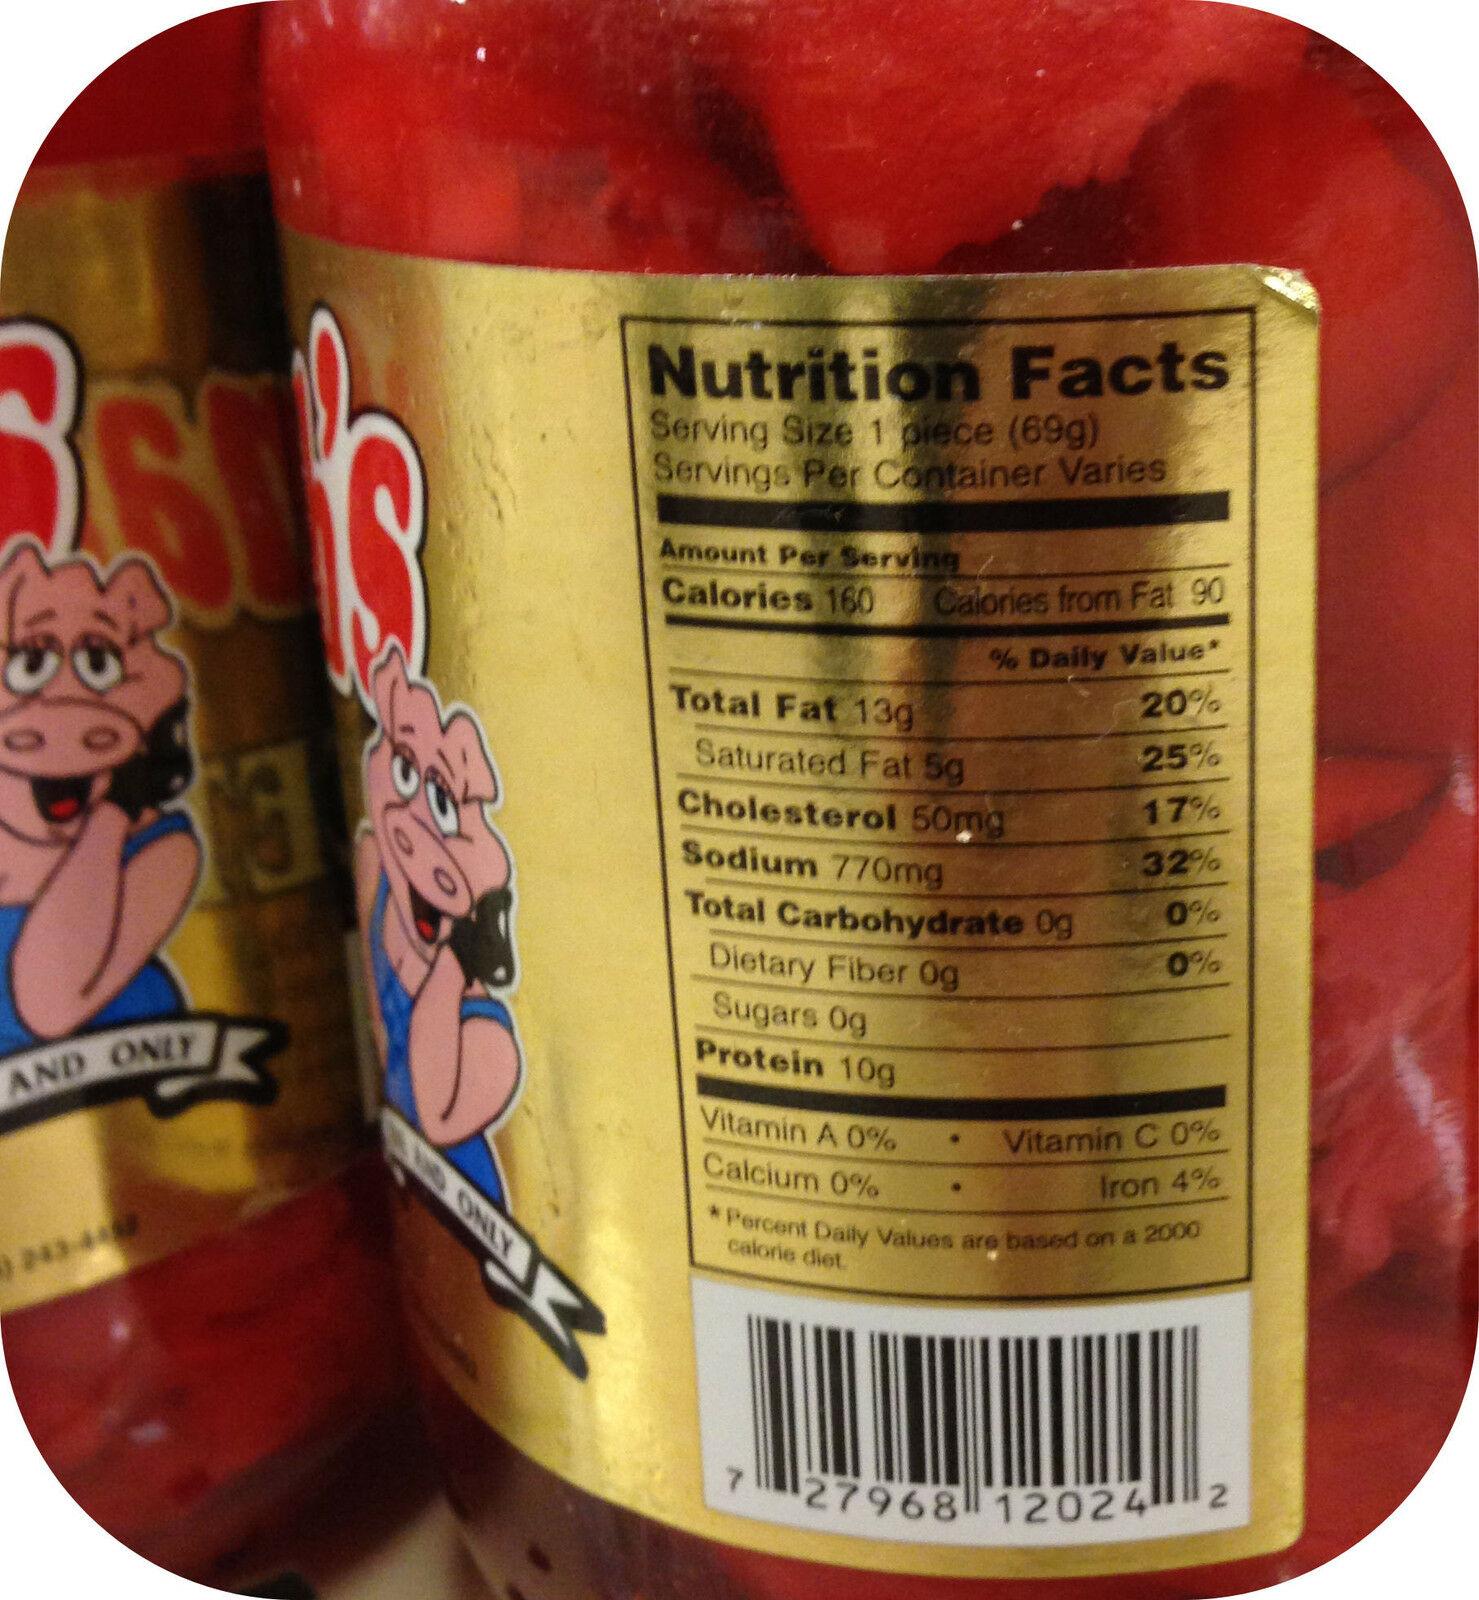 Hannah S Pickled Pig S Feet Jar Meat Snack Hot Like Sausage Wieners 1 2 Quart 727968120242 Ebay